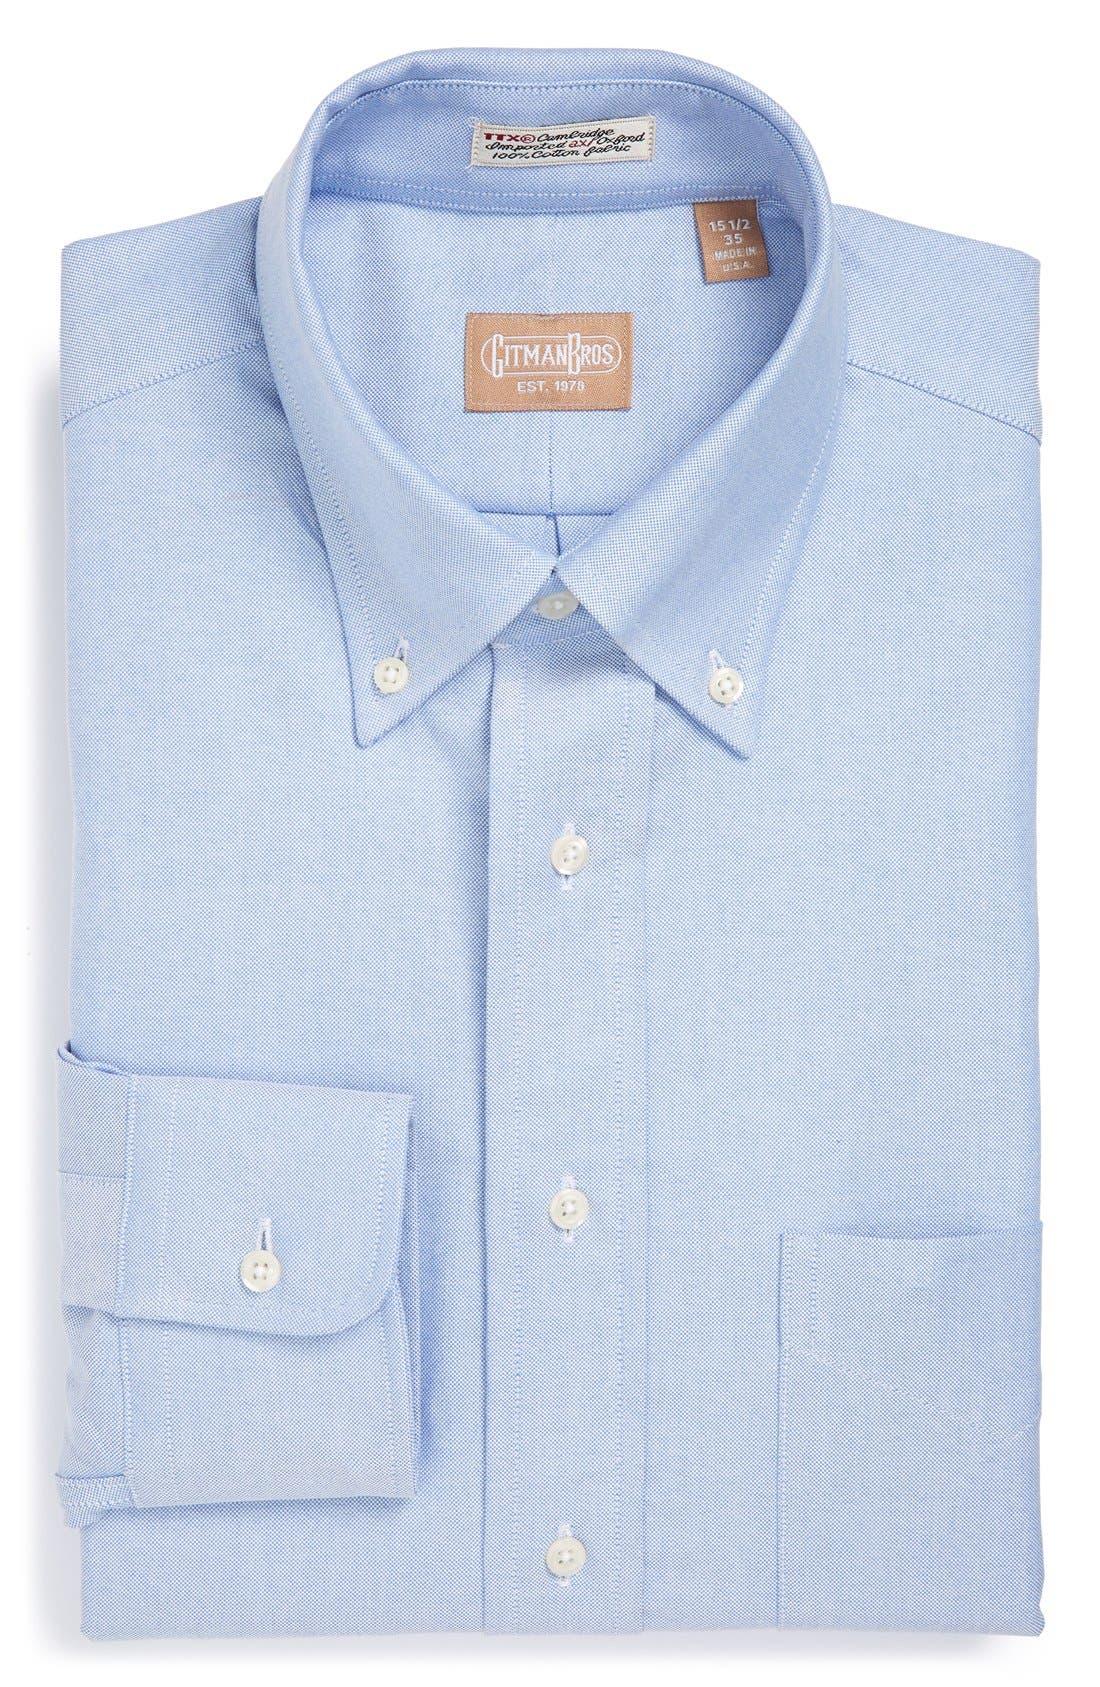 GITMAN, 'Cambridge Oxford' Regular Fit Dress Shirt, Main thumbnail 1, color, BLUE